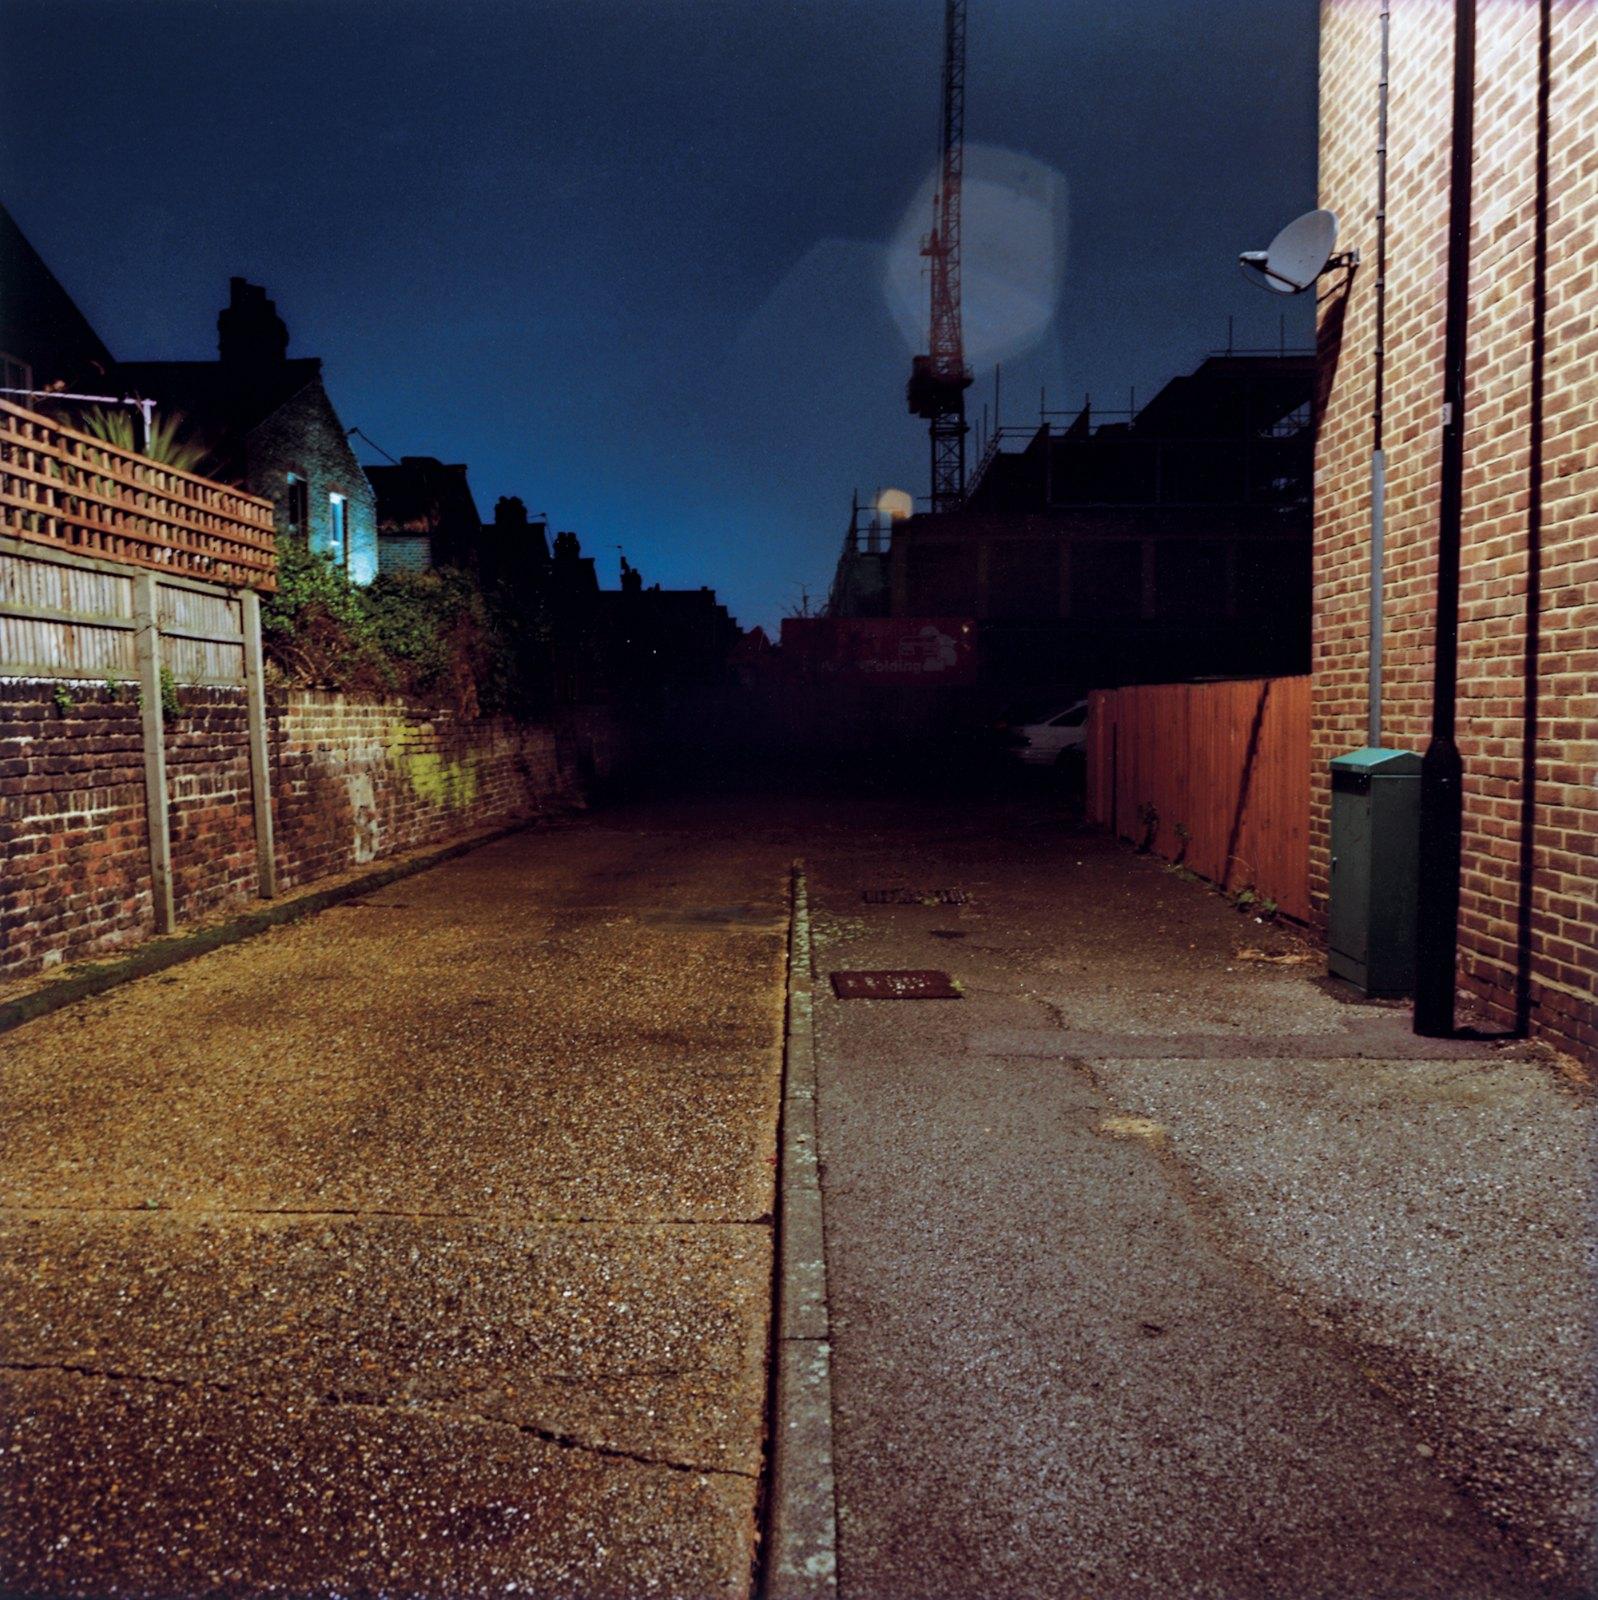 Road, London 22:45, 2008, C-print, 100 x 100 cm